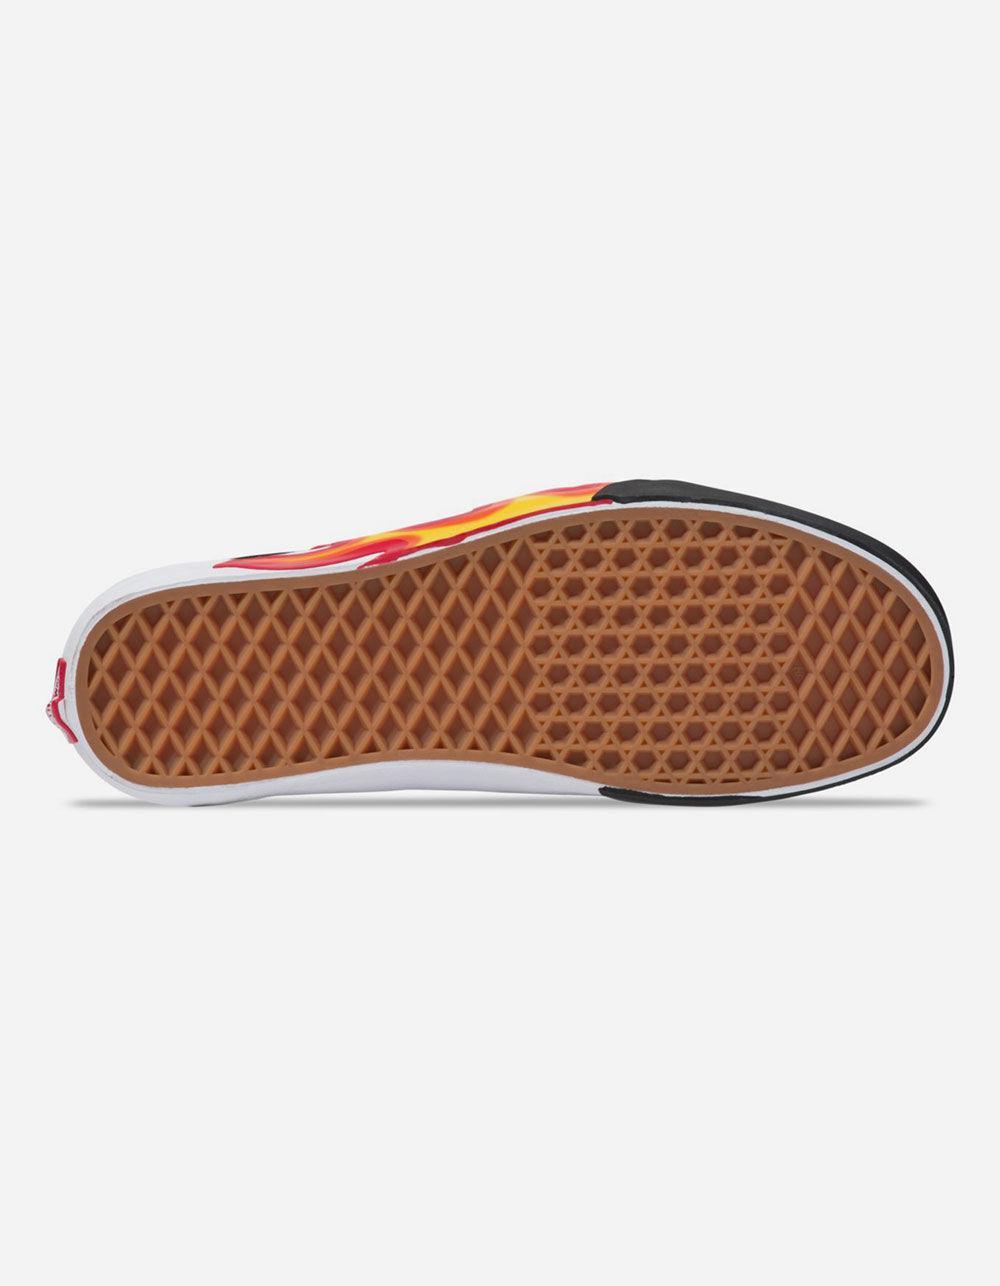 29e9e5fb0d8 Vans - Black Flame Cut Out Old Skool Shoes for Men - Lyst. View fullscreen